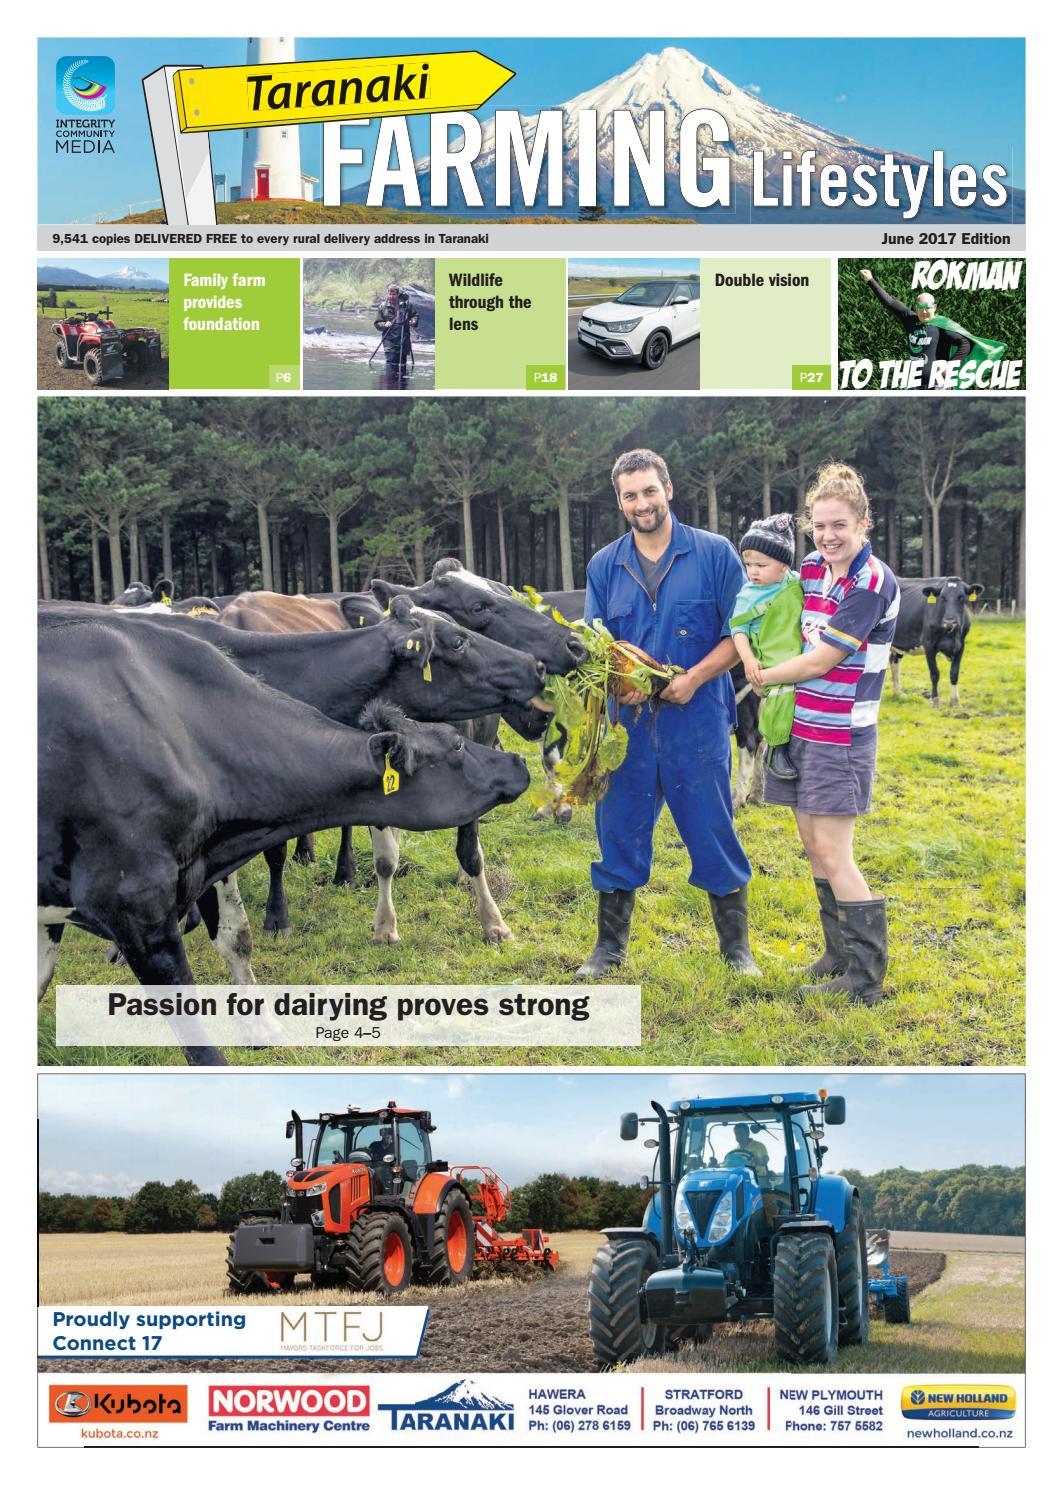 Taranaki Farming Lifestyles June 2017 by NorthSouth Multi Media Ltd - issuu